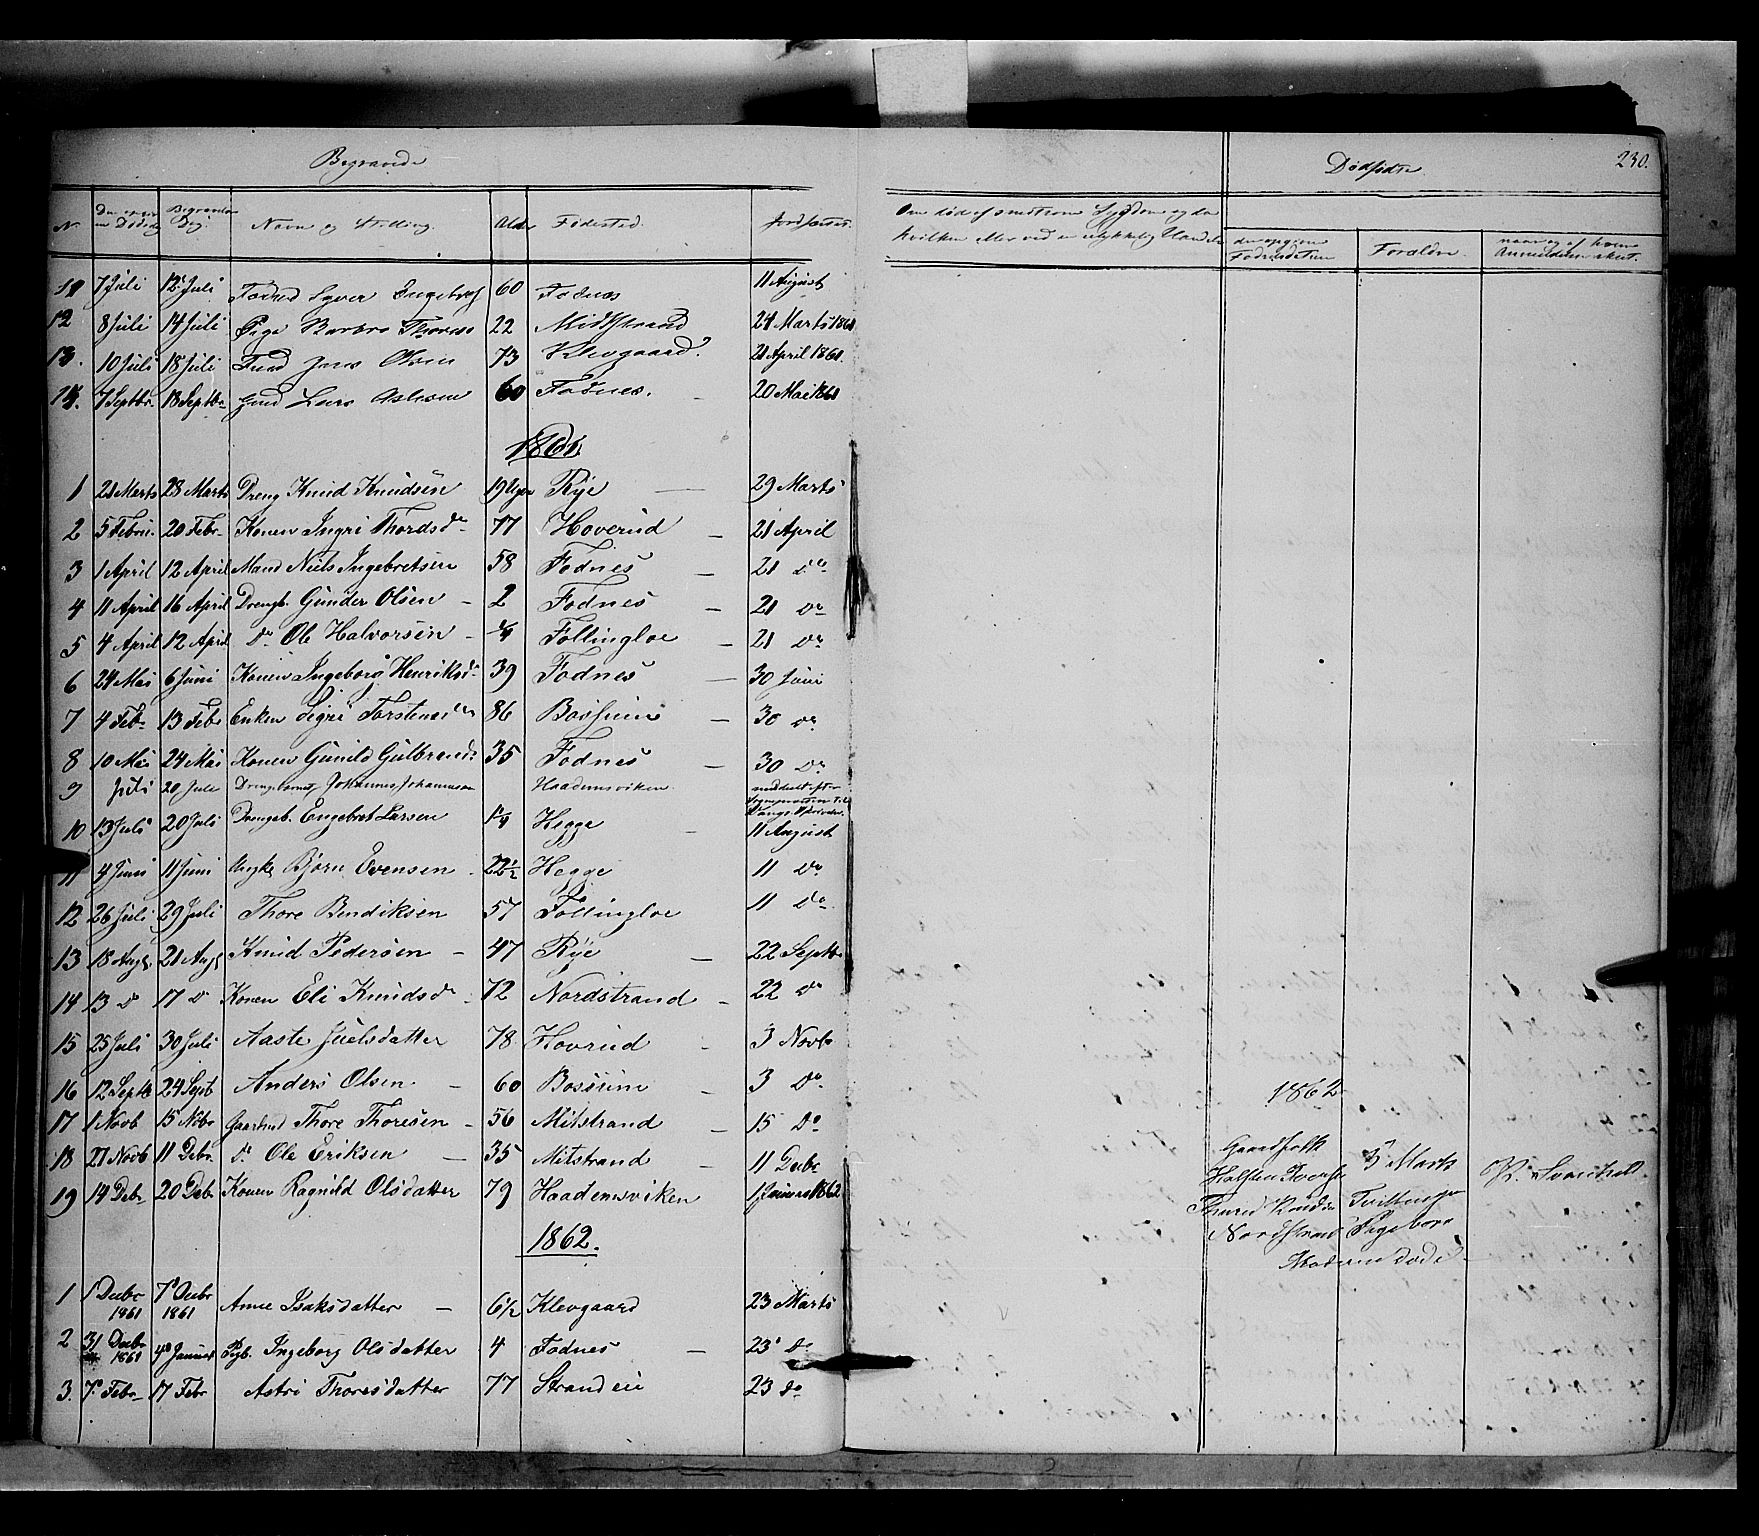 SAH, Nord-Aurdal prestekontor, Ministerialbok nr. 5, 1842-1863, s. 230